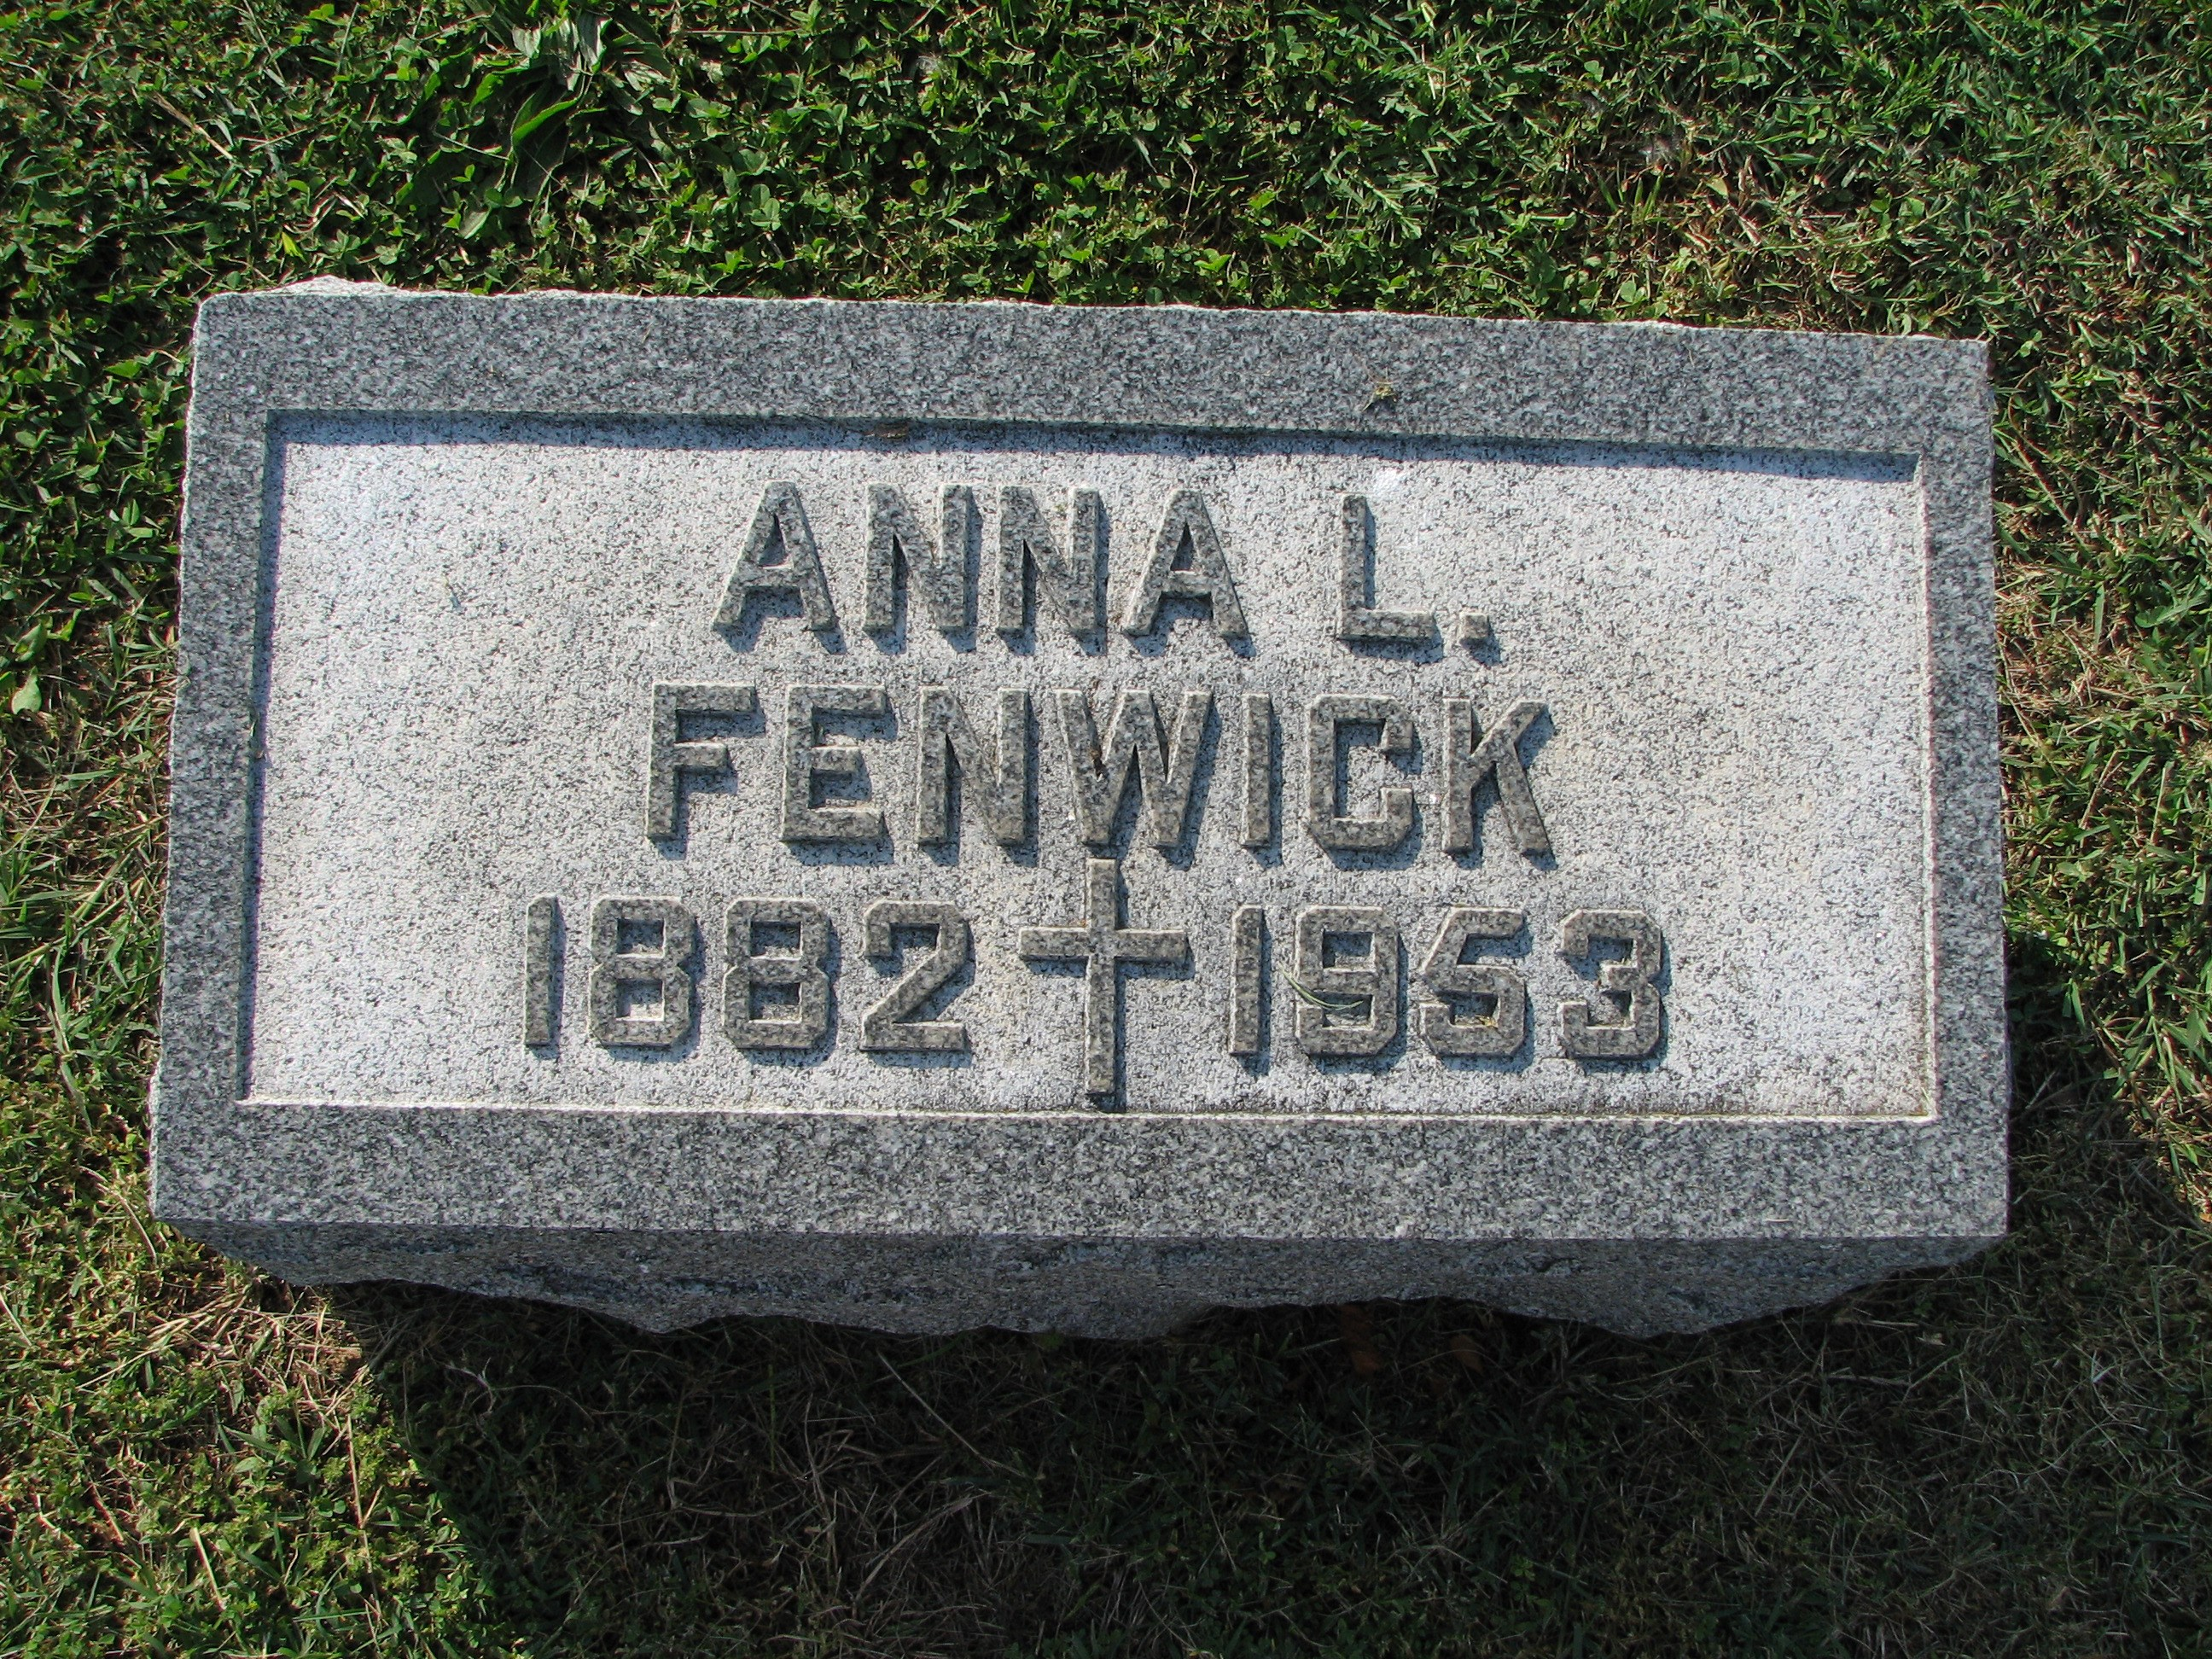 Anna Fenwick